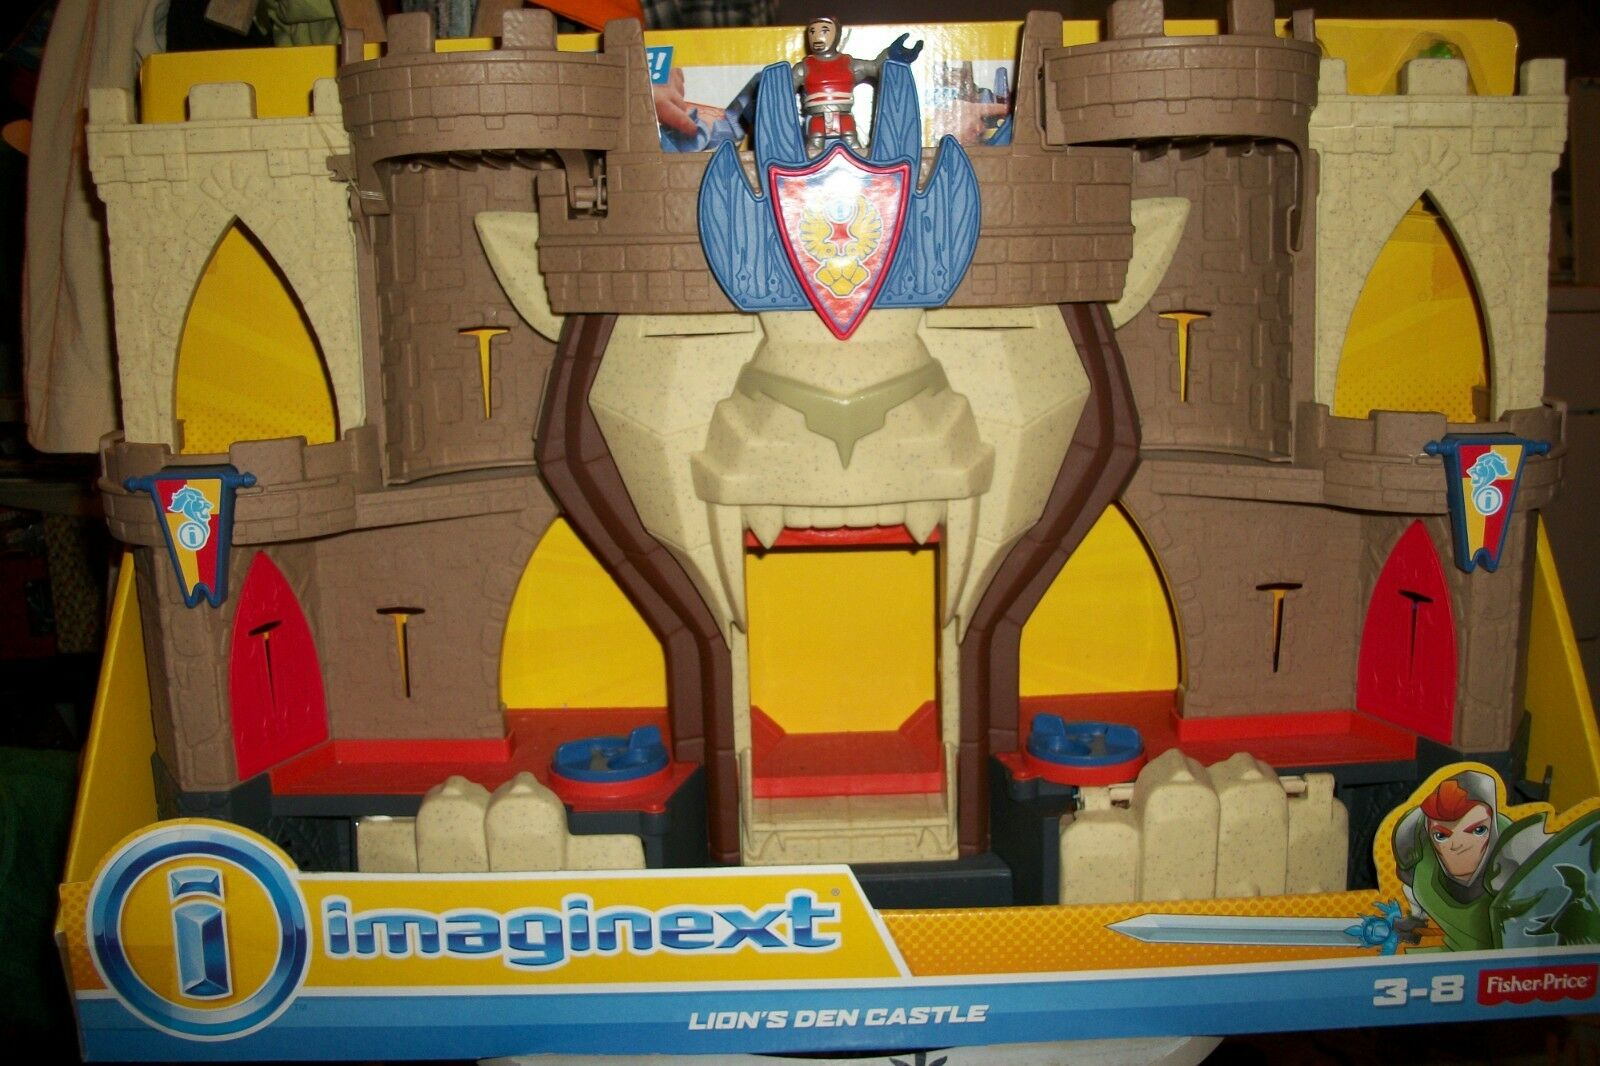 NIB Imaginext Imaginext Imaginext Lions Den Castle, Fisher Price 8b71bf